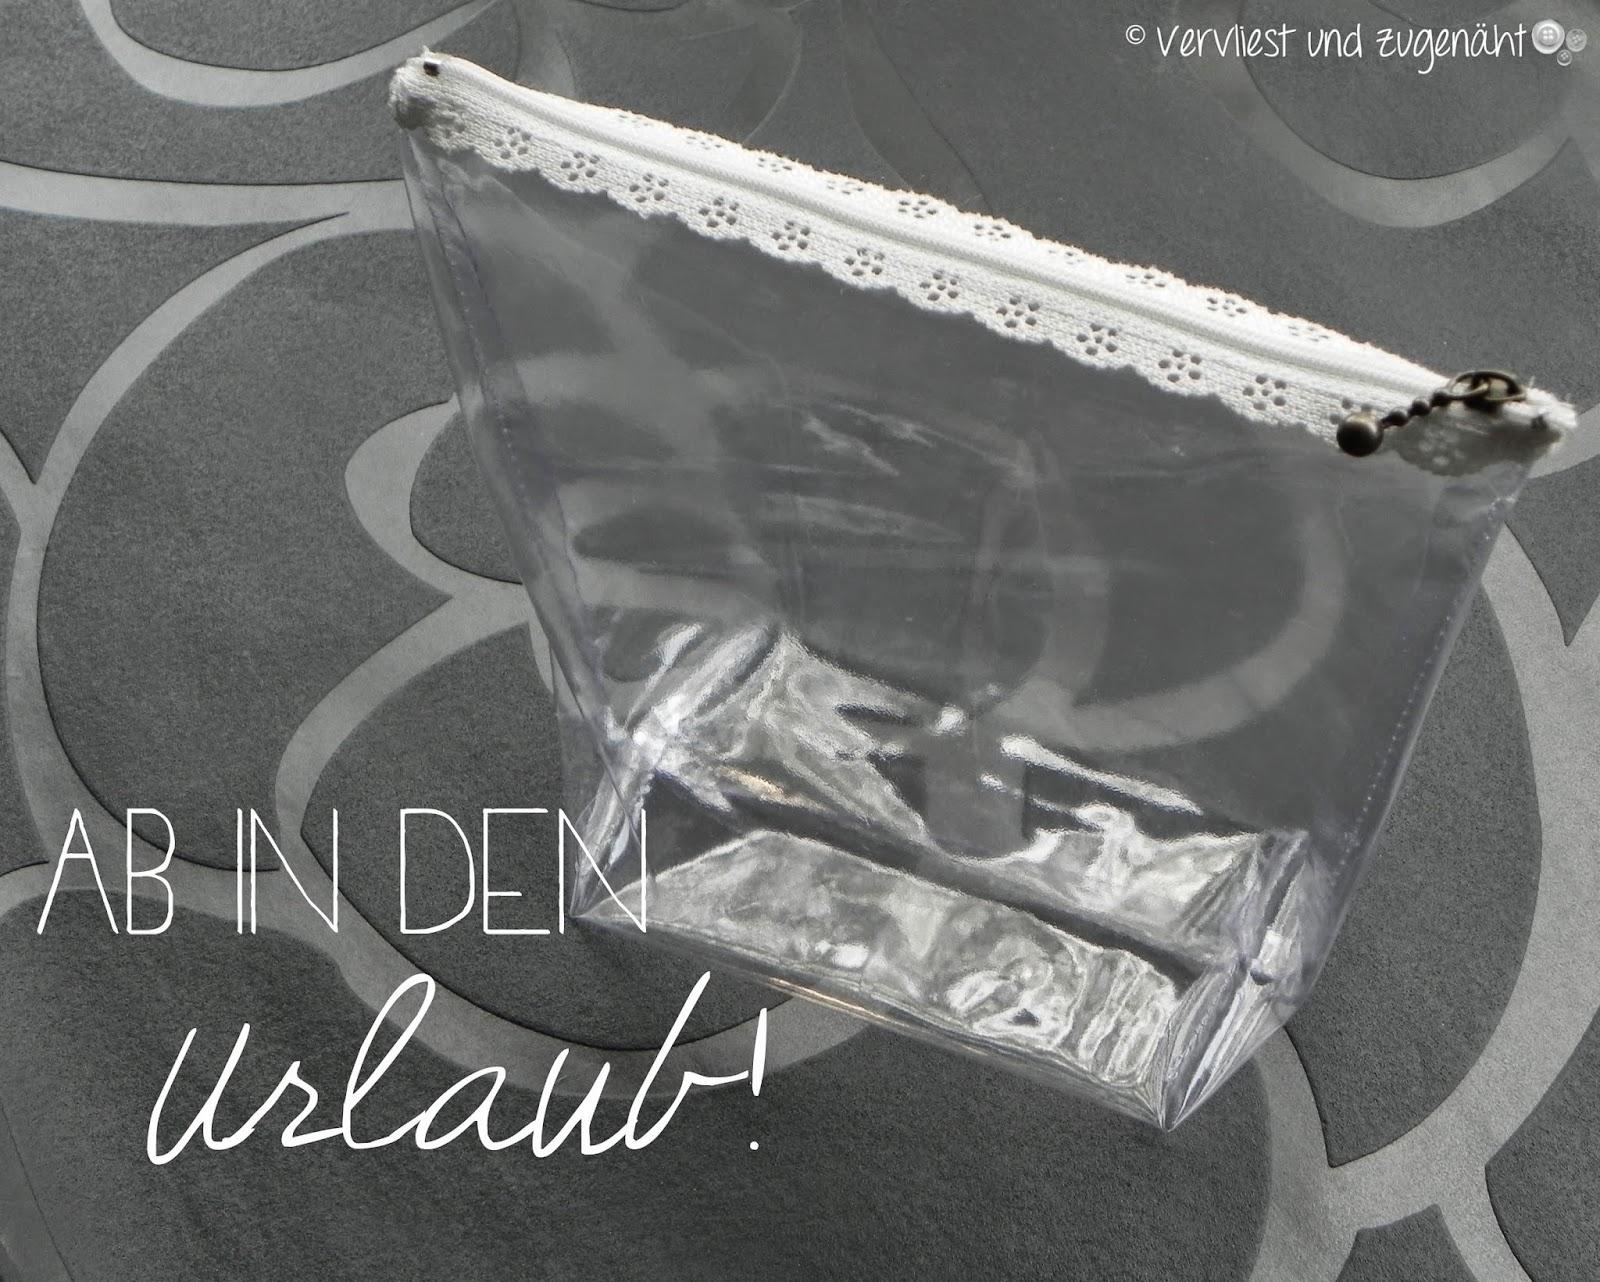 http://vervliestundzugenaeht.blogspot.de/2014/06/flugzeug-kosmetik-taschchen-aus-plastik.html